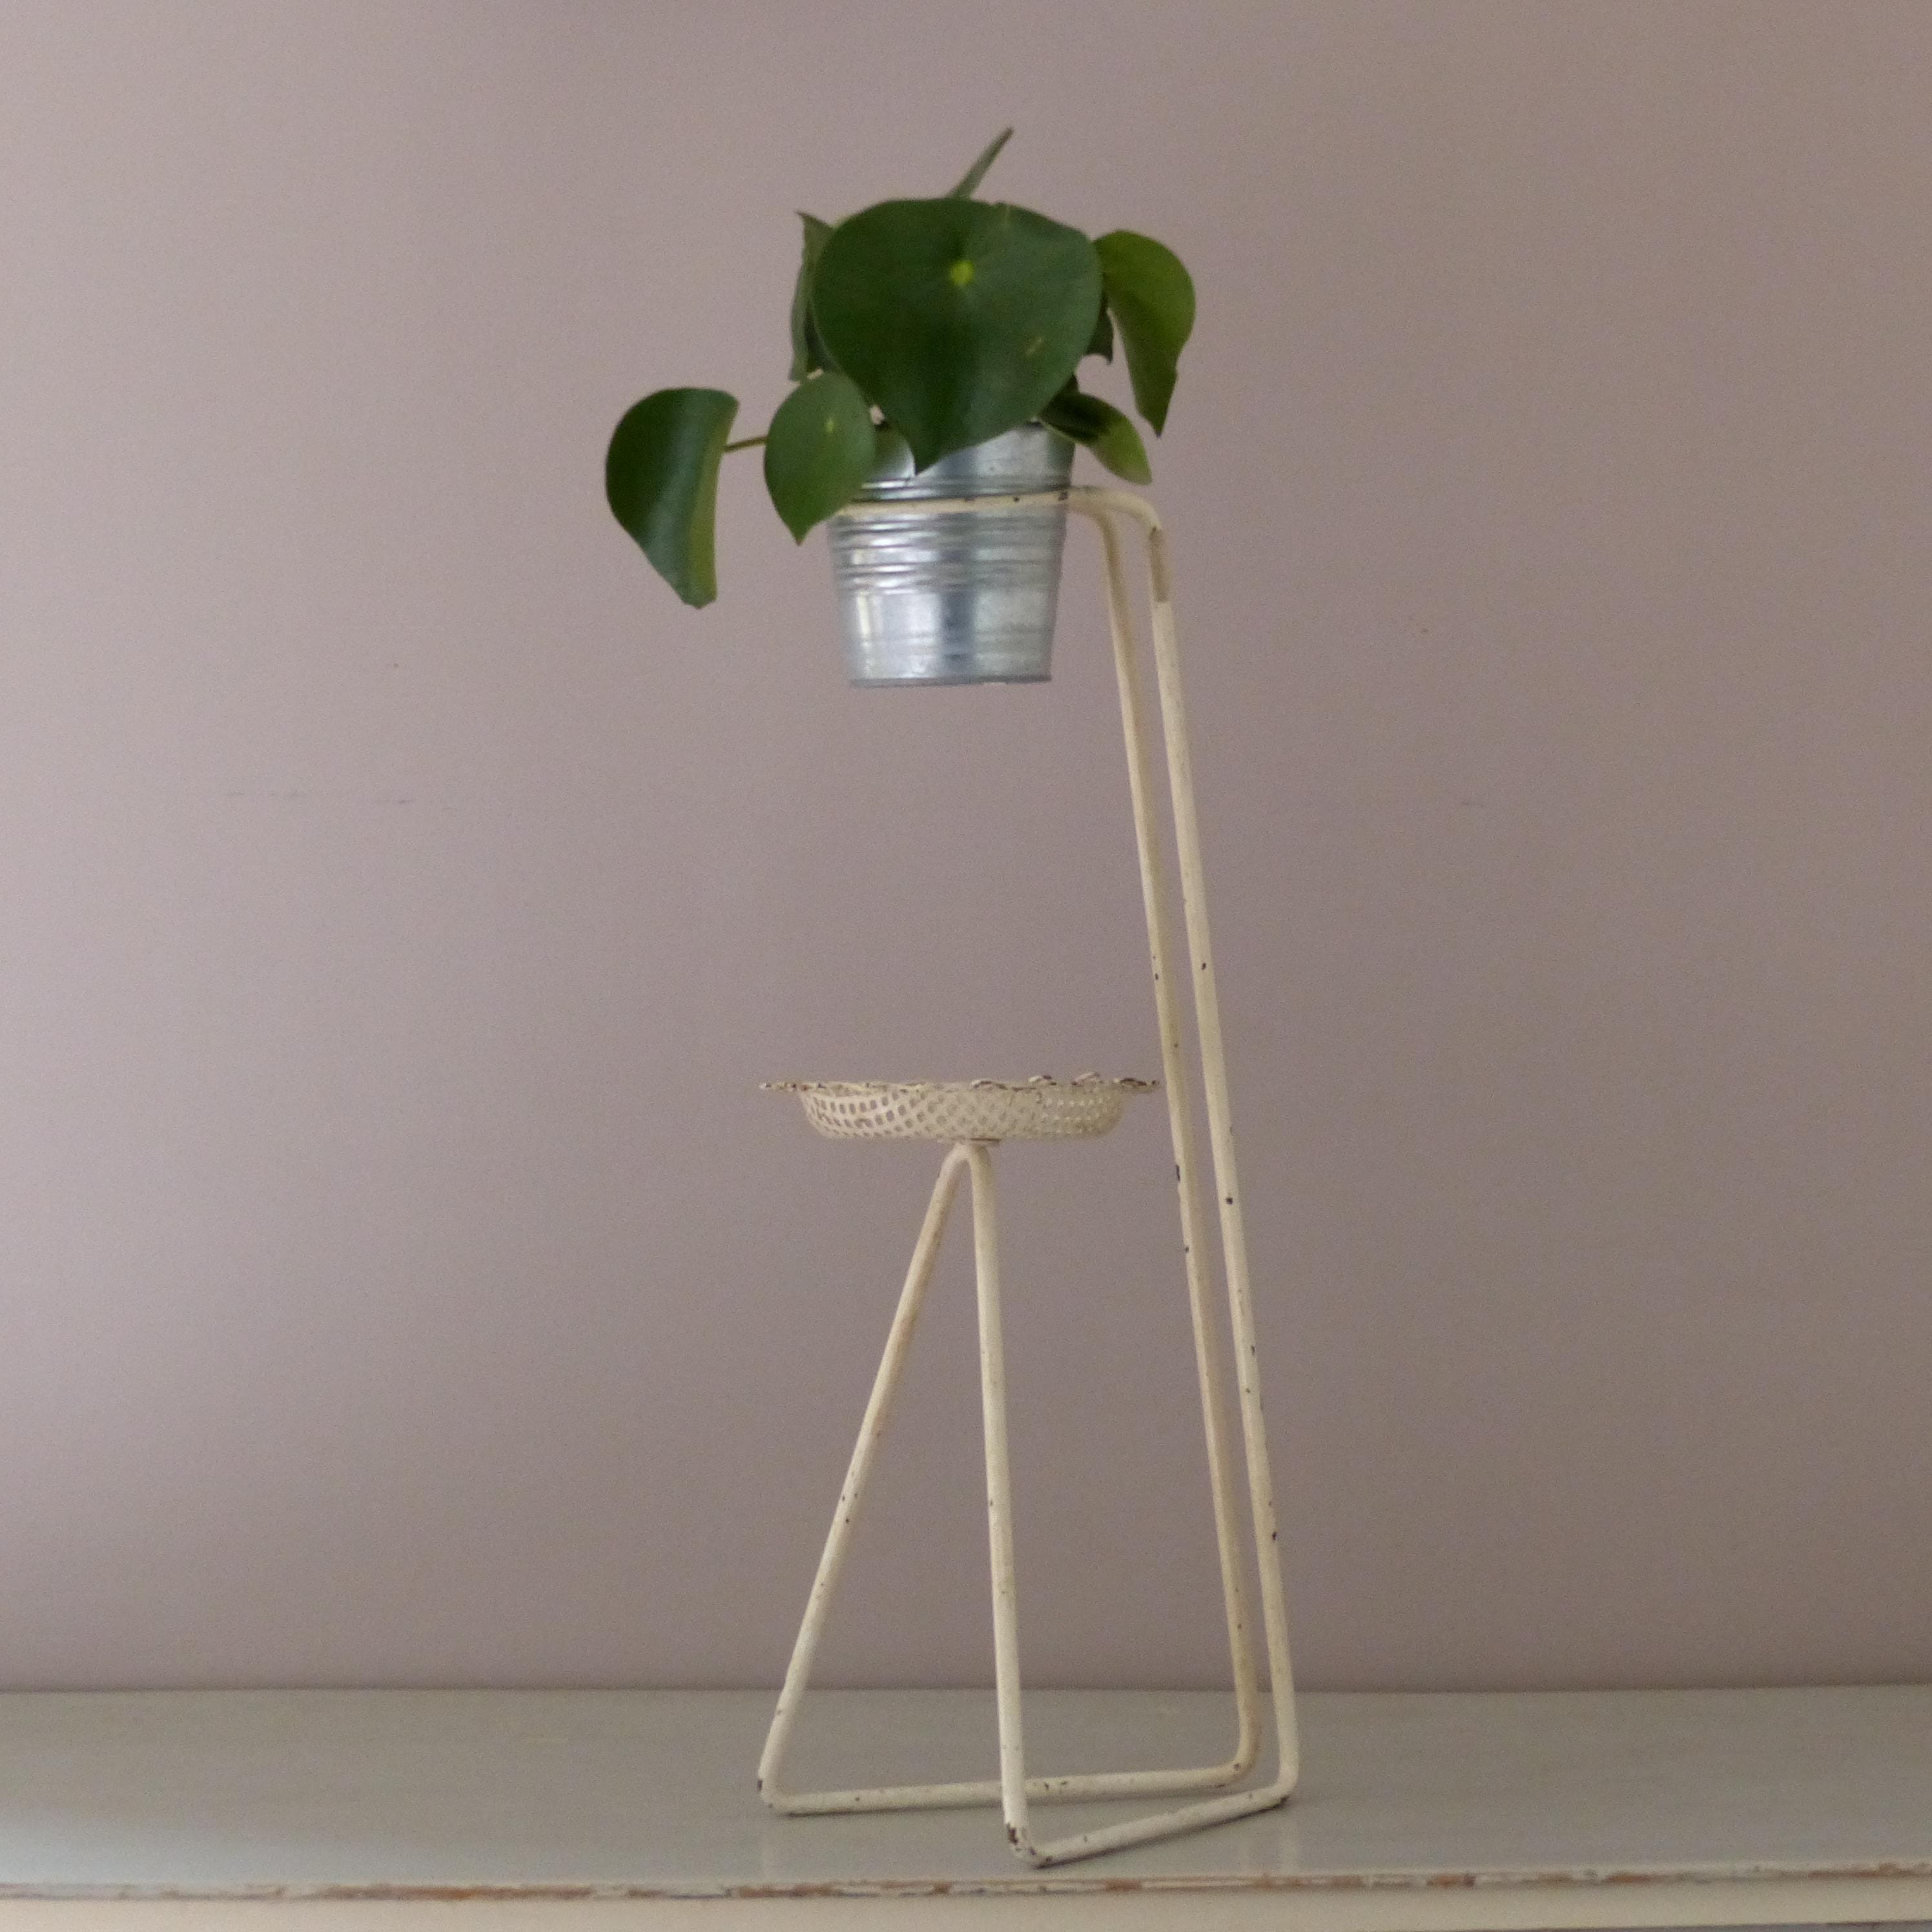 porte plante en m tal perfor esprit mat got lignedebrocante brocante en ligne chine pour vous. Black Bedroom Furniture Sets. Home Design Ideas